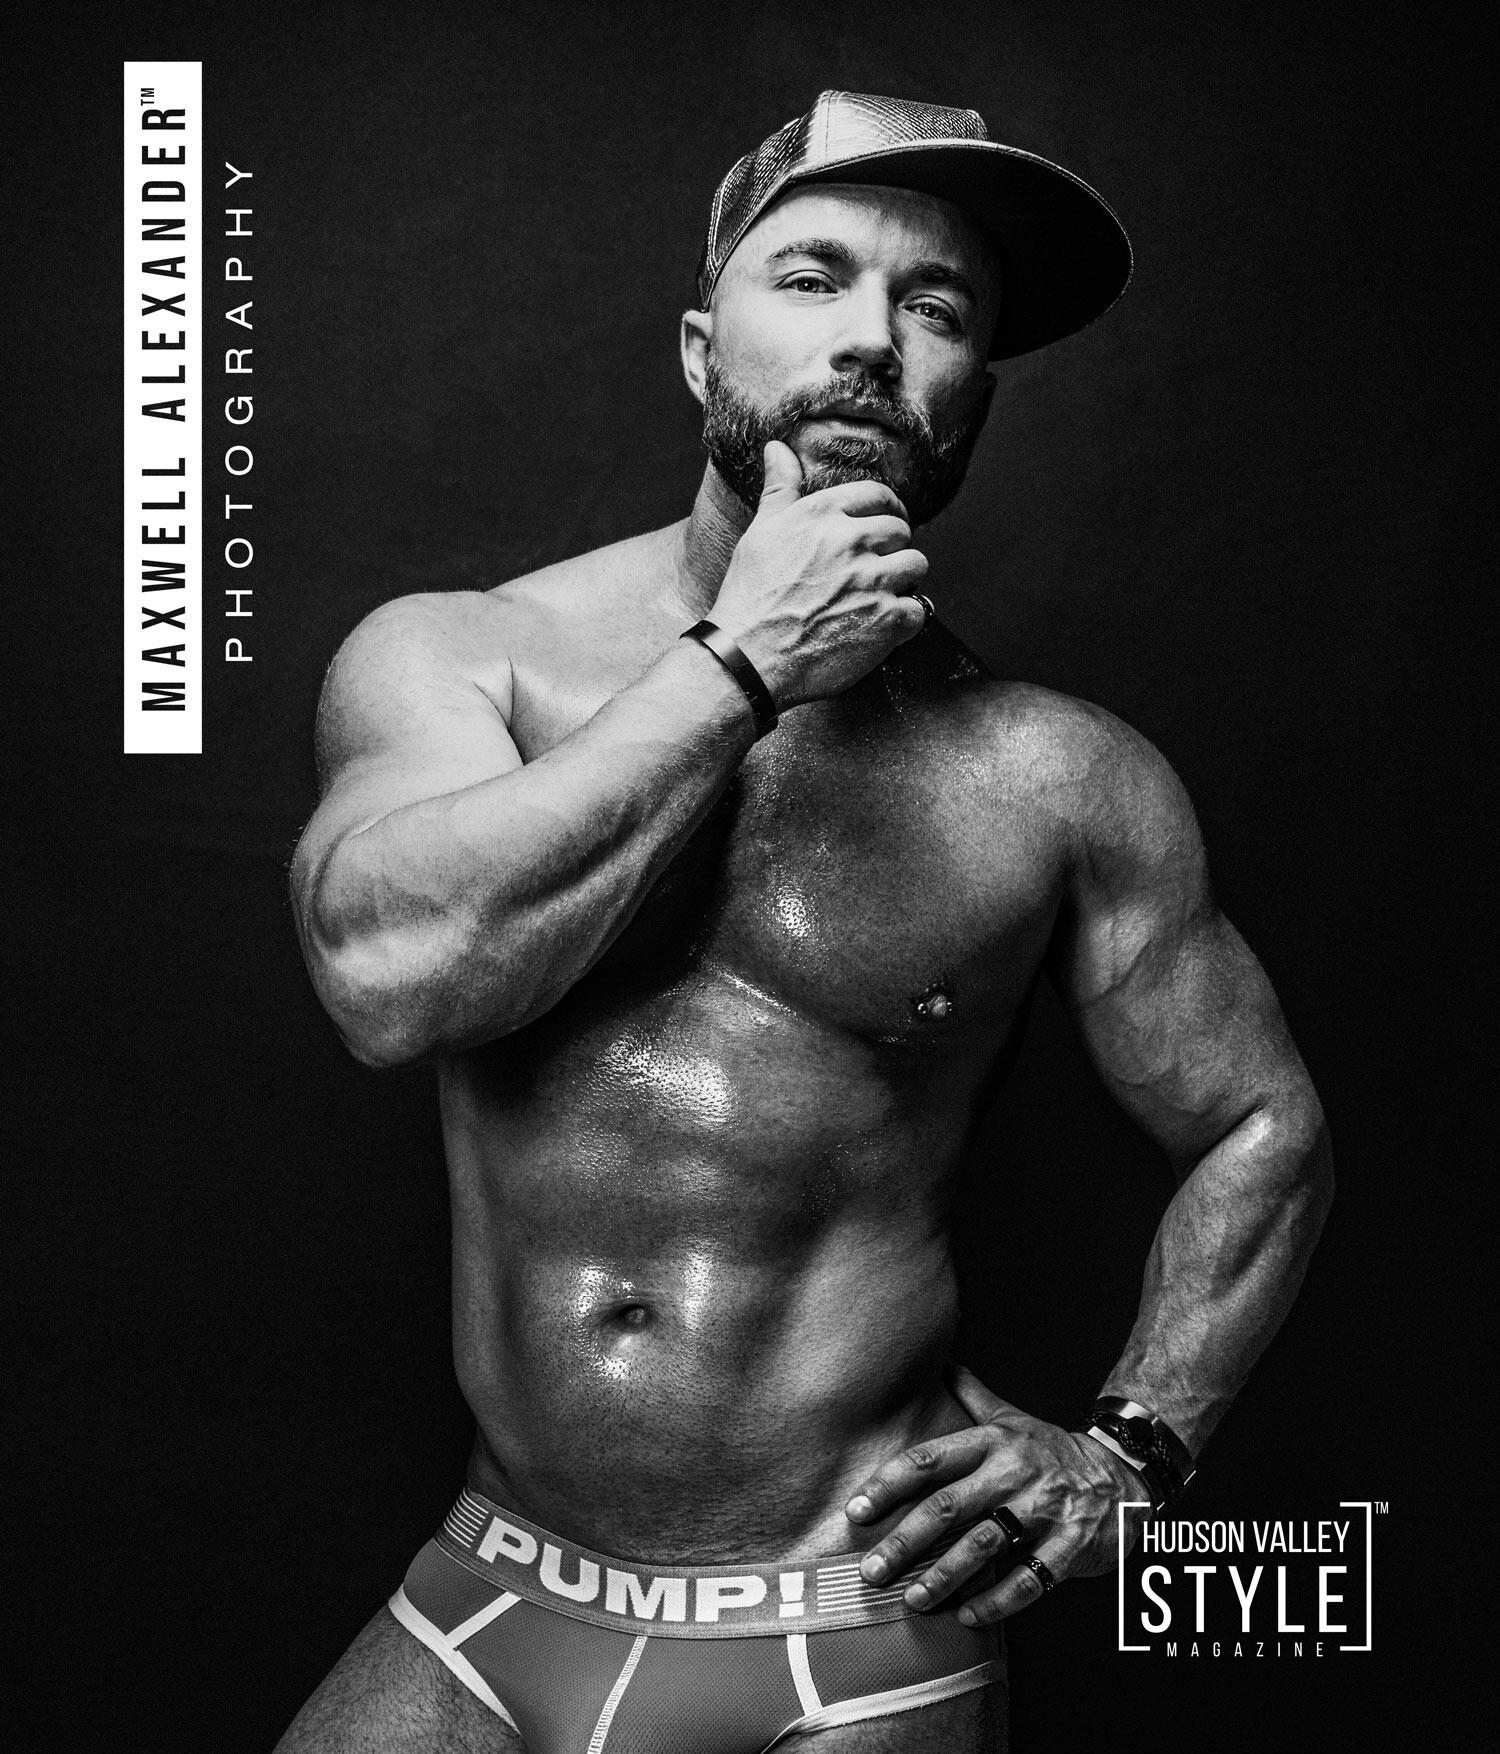 Hardcore Bodybuilding isn't for Everyone – Bodybuilding 101 with Coach Maxwell Alexander – Photographer/Fitness Model - Maxwell Alexander – Duncan Avenue Studios, New York